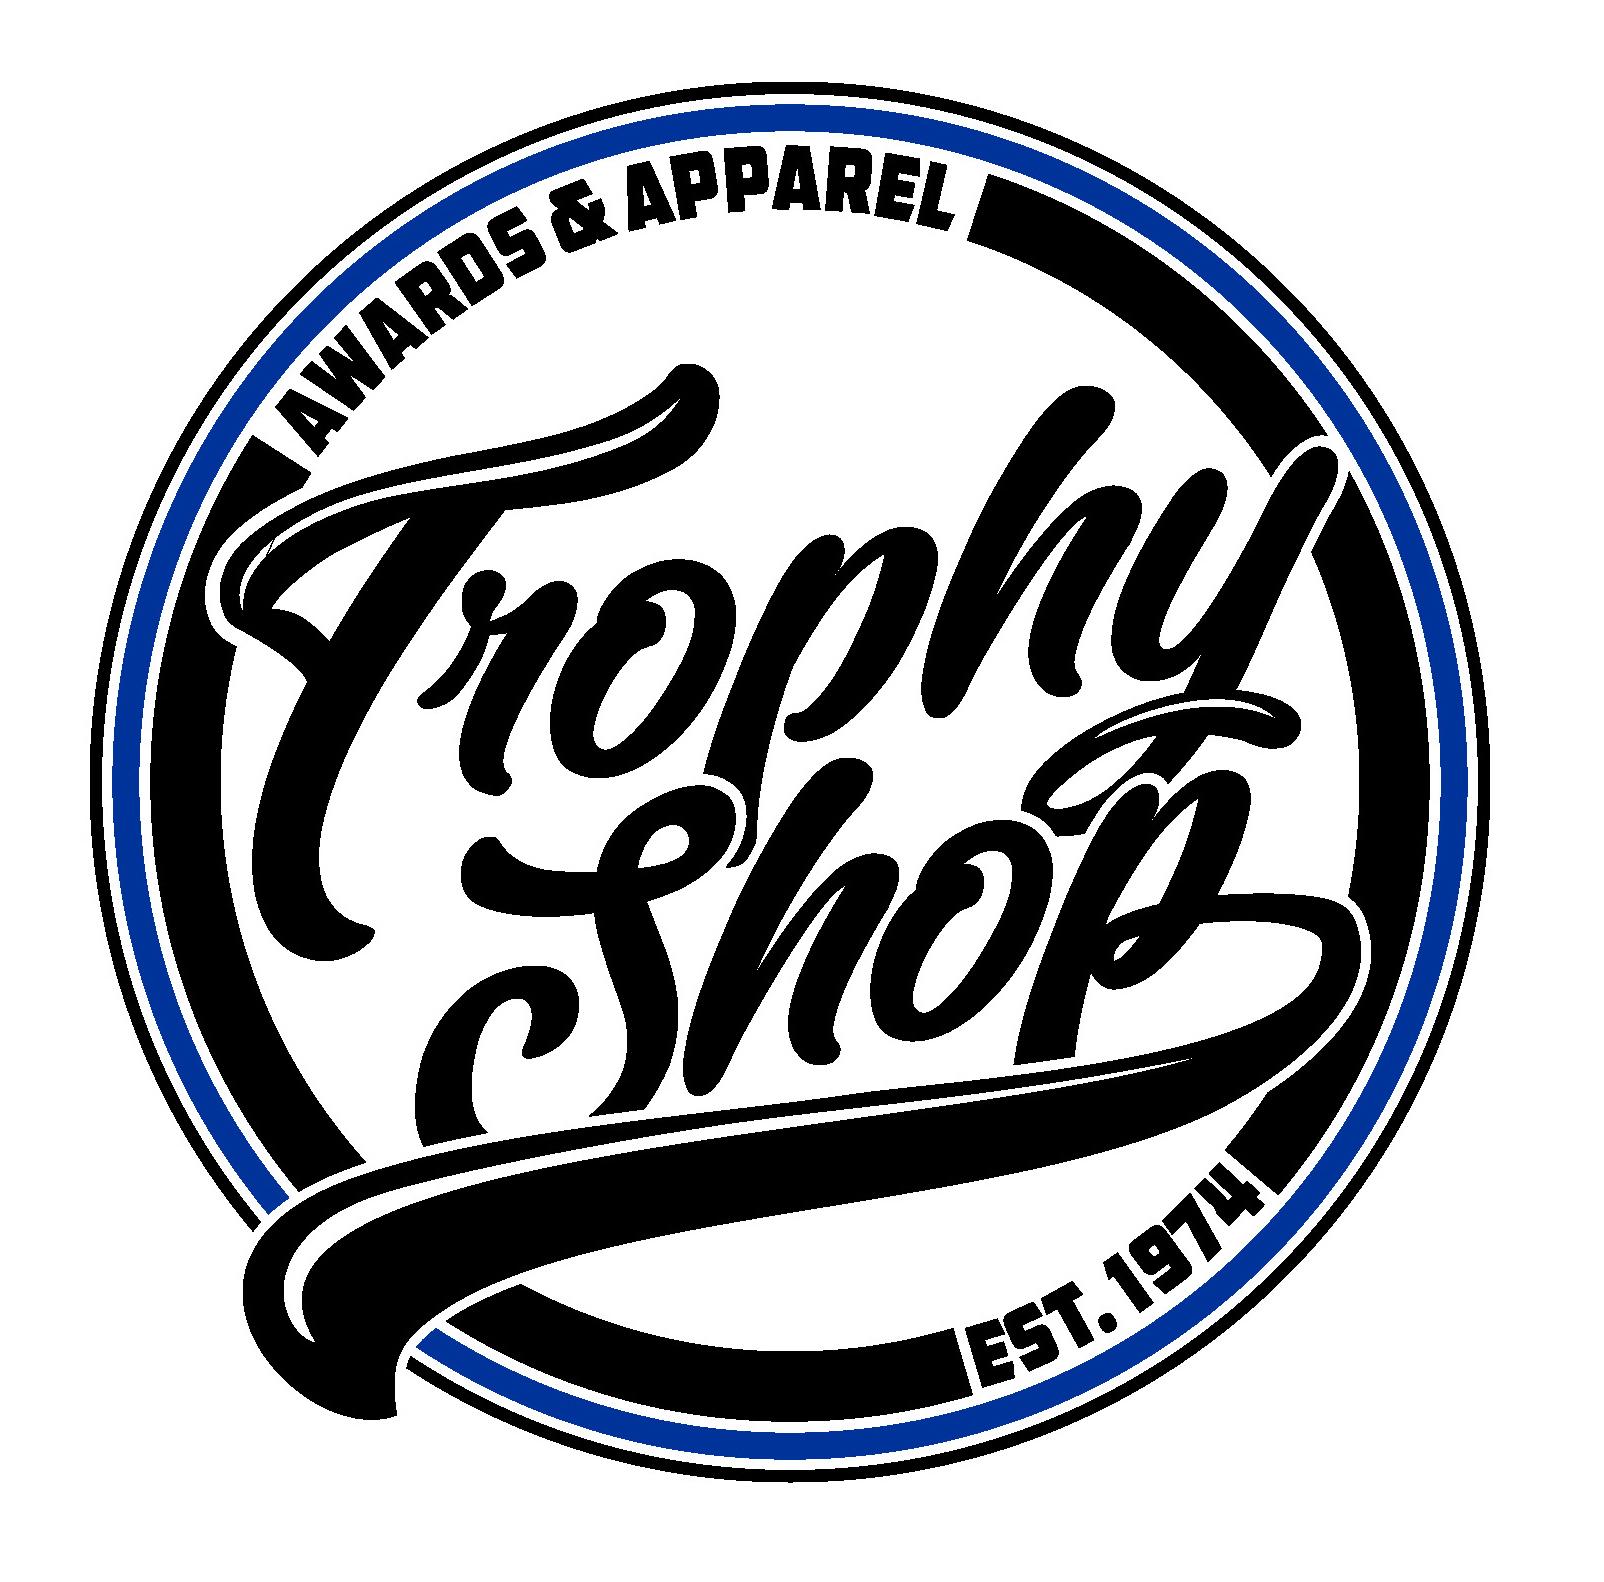 trophy shop.jpg